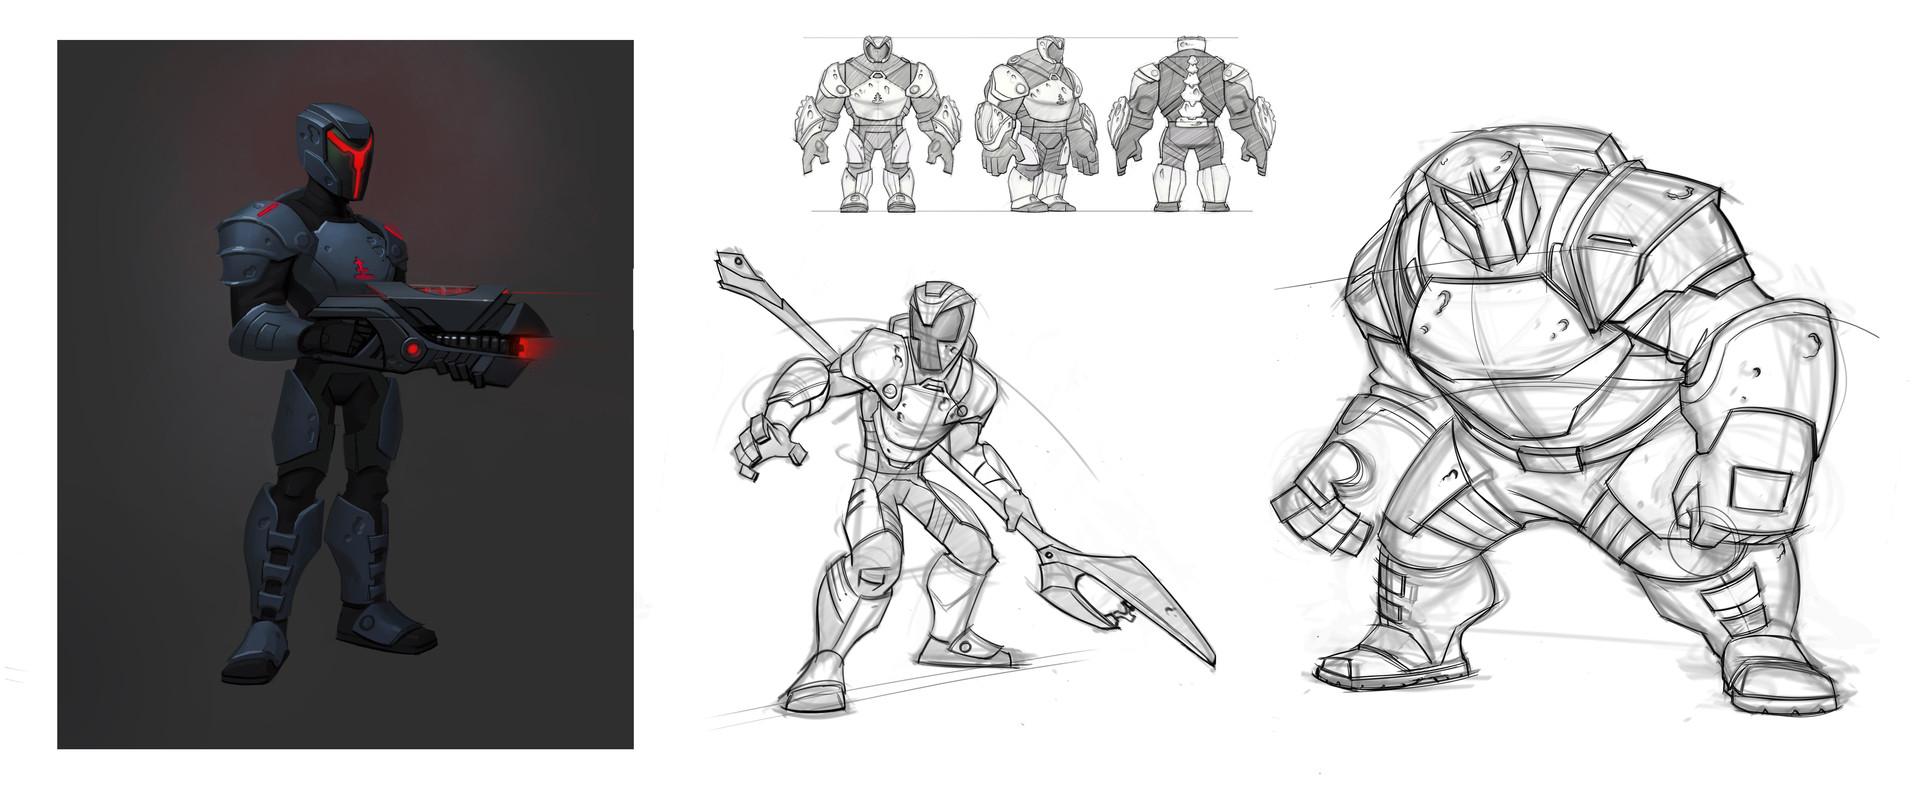 Character Design Art Station : Josh black sakaran enemy designs for disney infinity